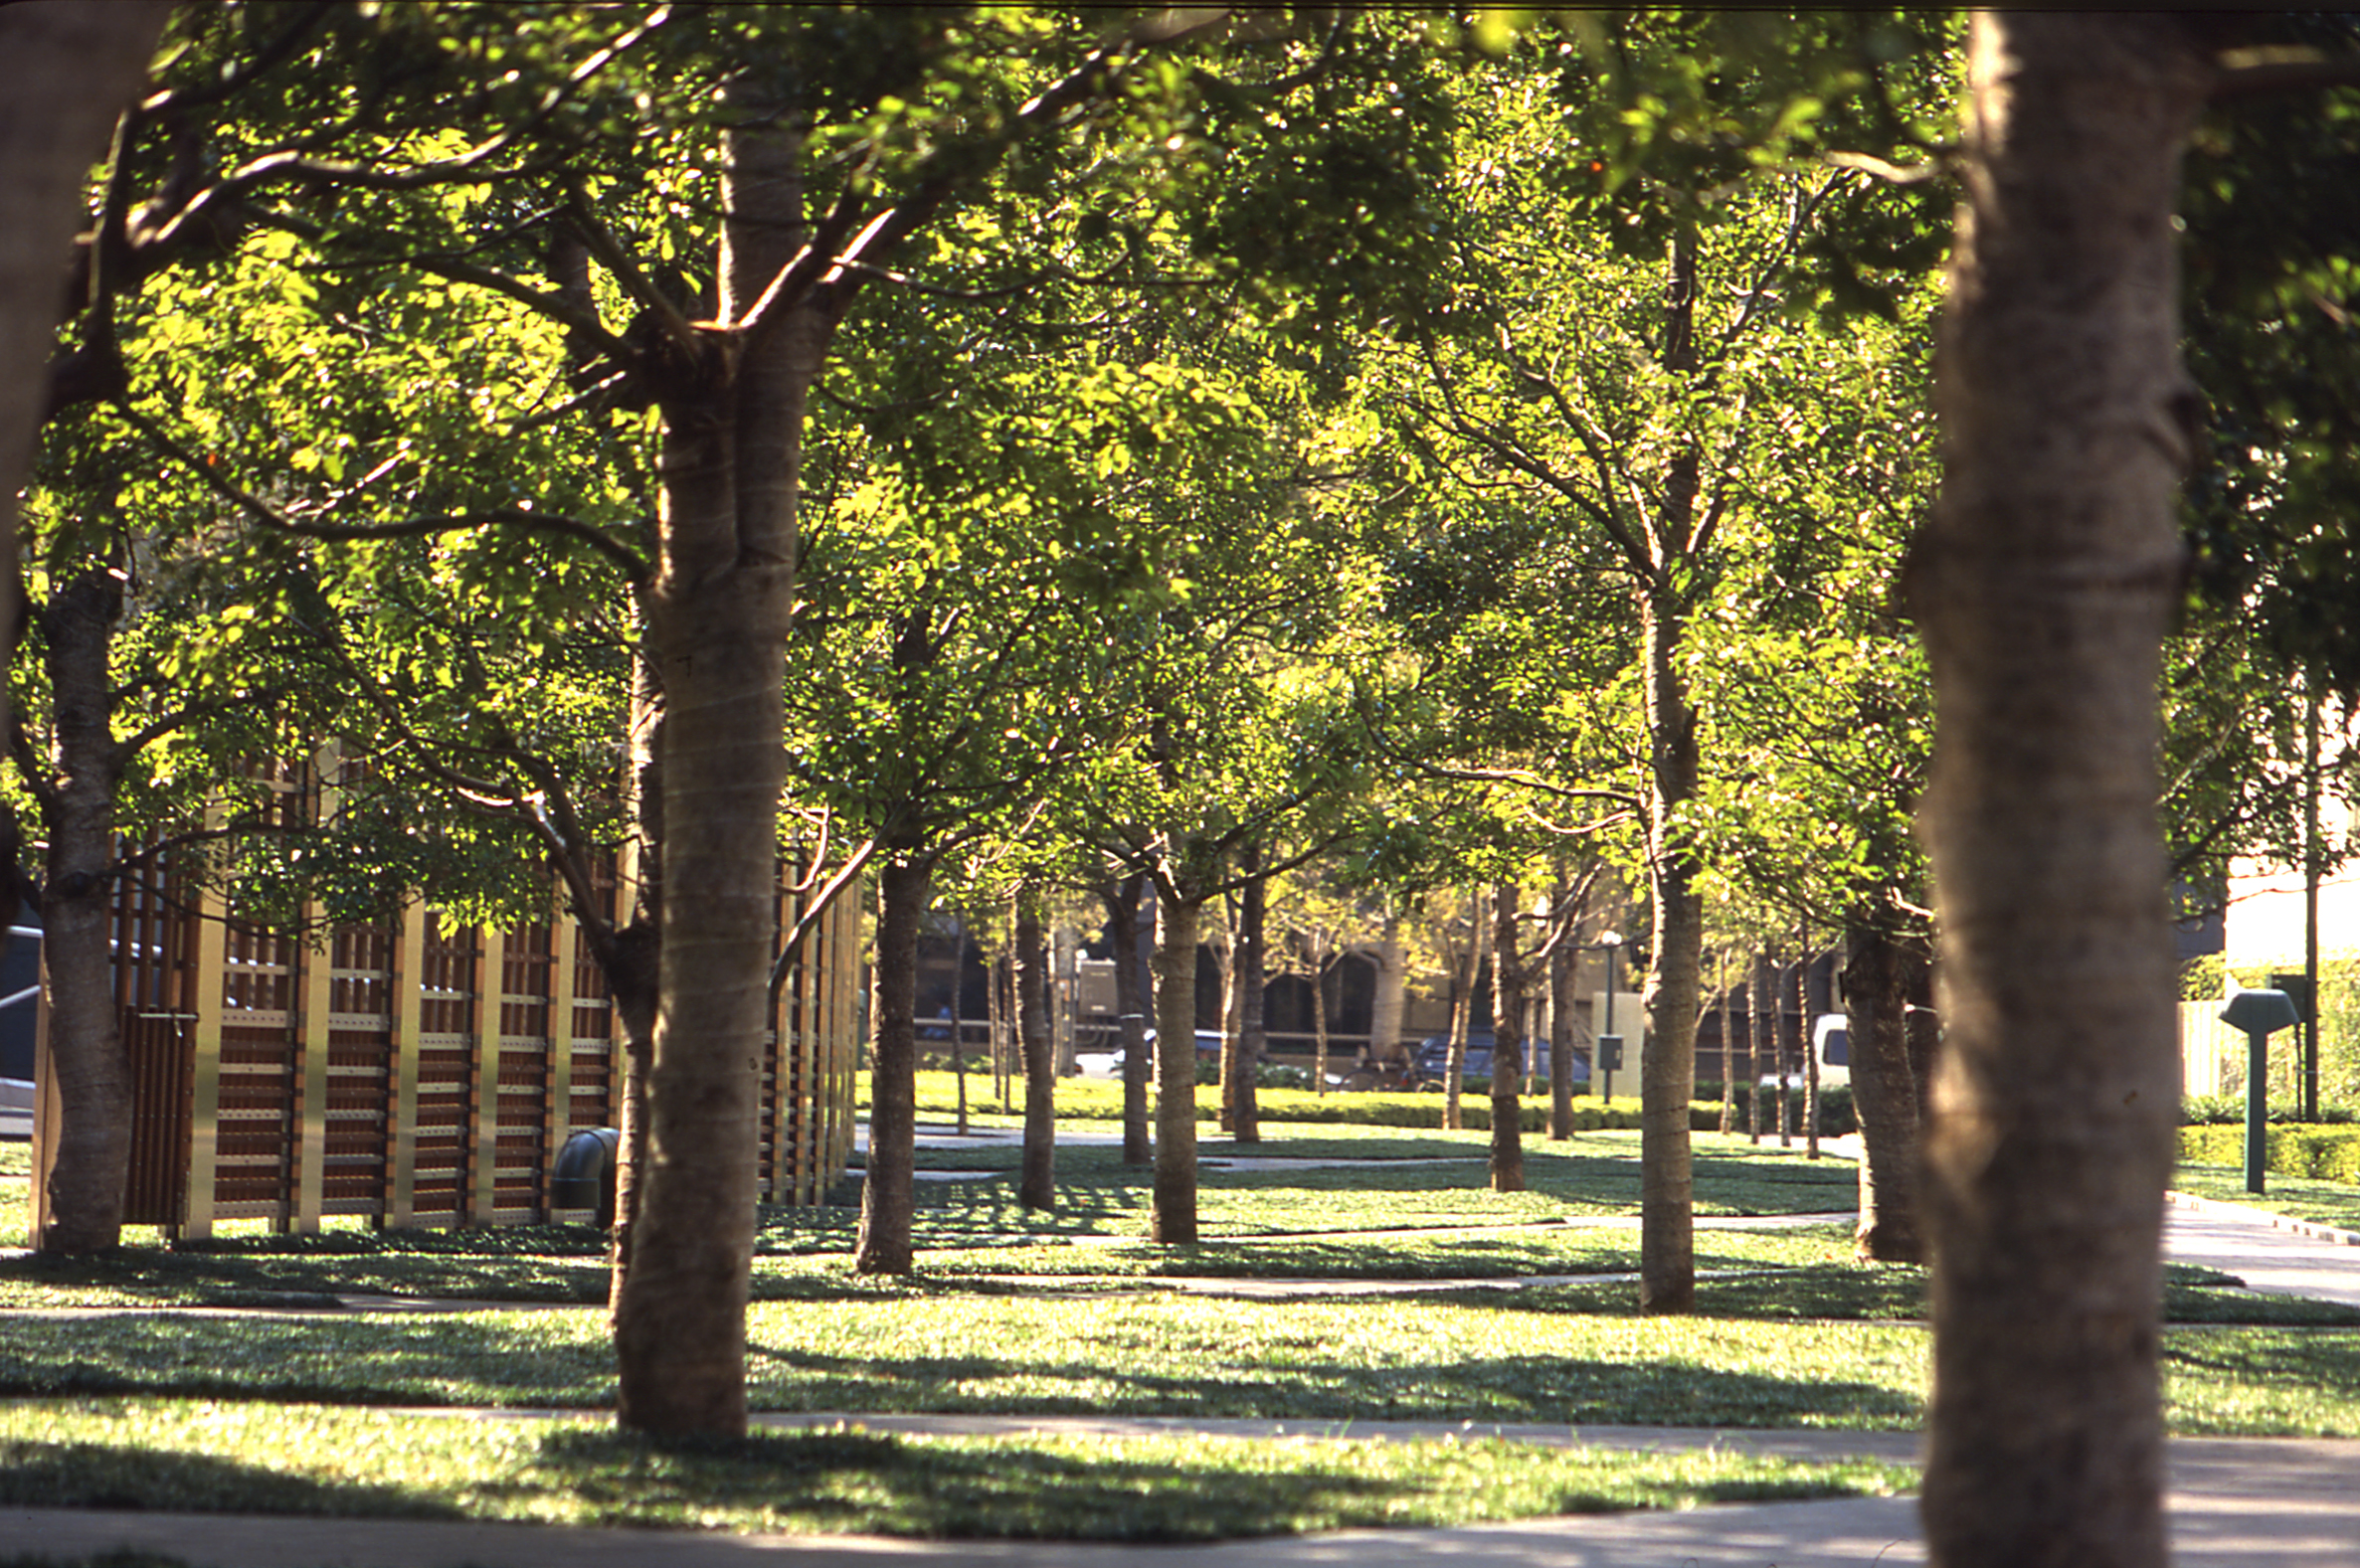 BA_ntt_trees.jpg